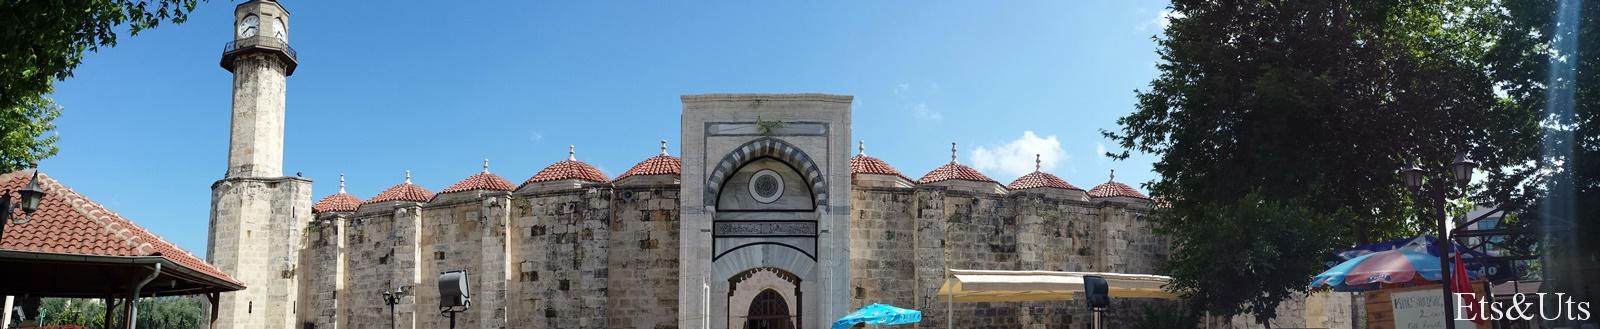 MezquitaPan